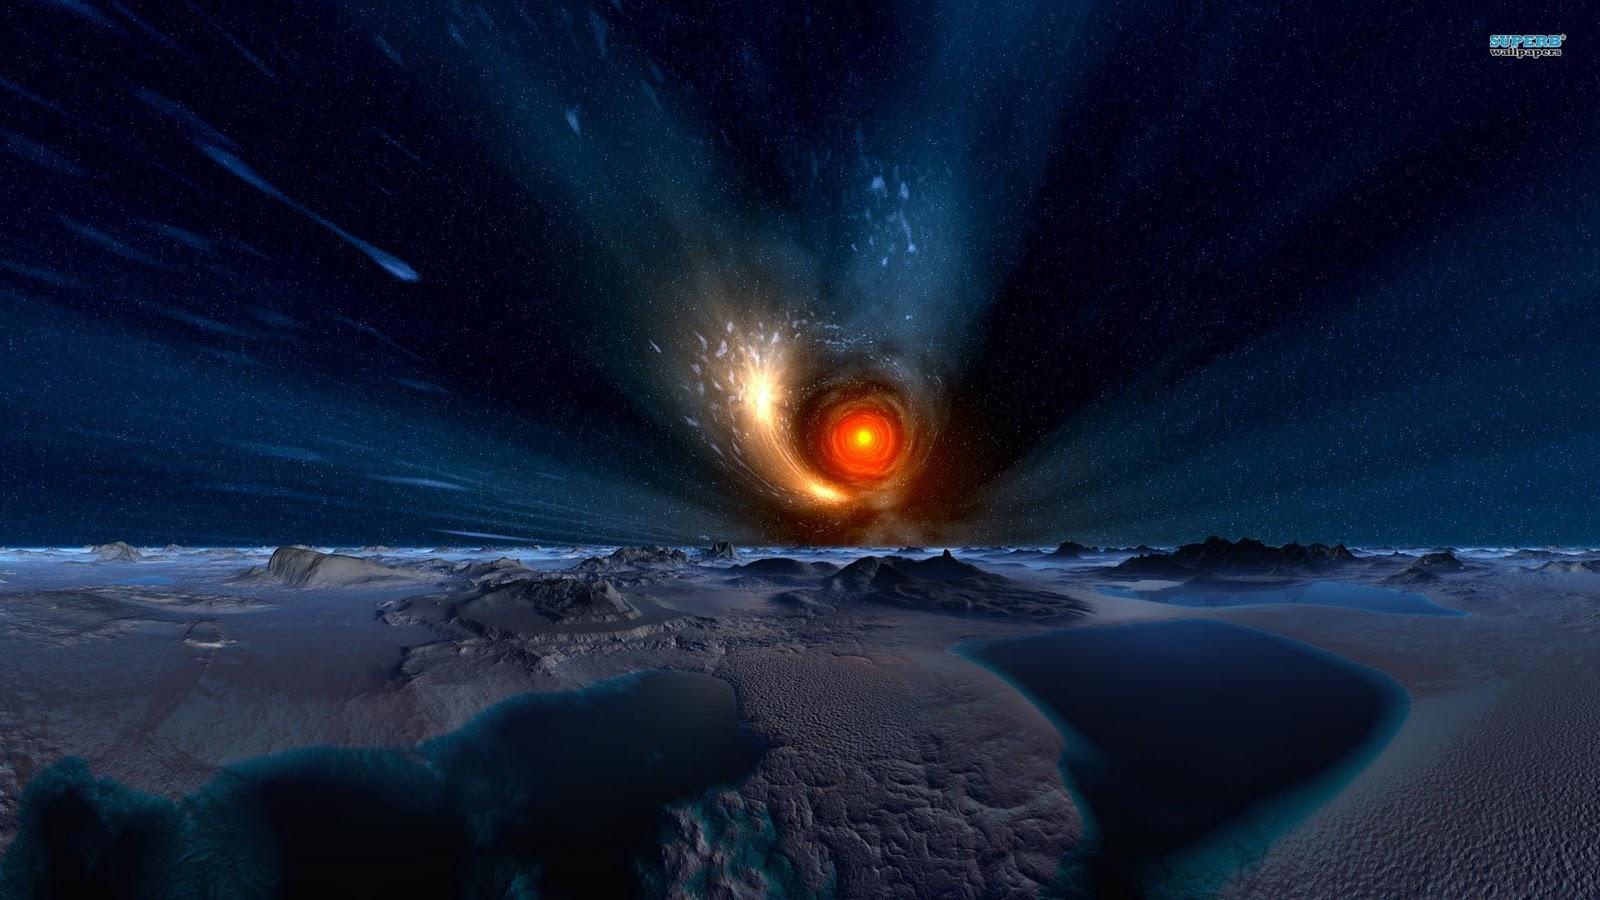 black hole wallpaper moving - wallpapersafari